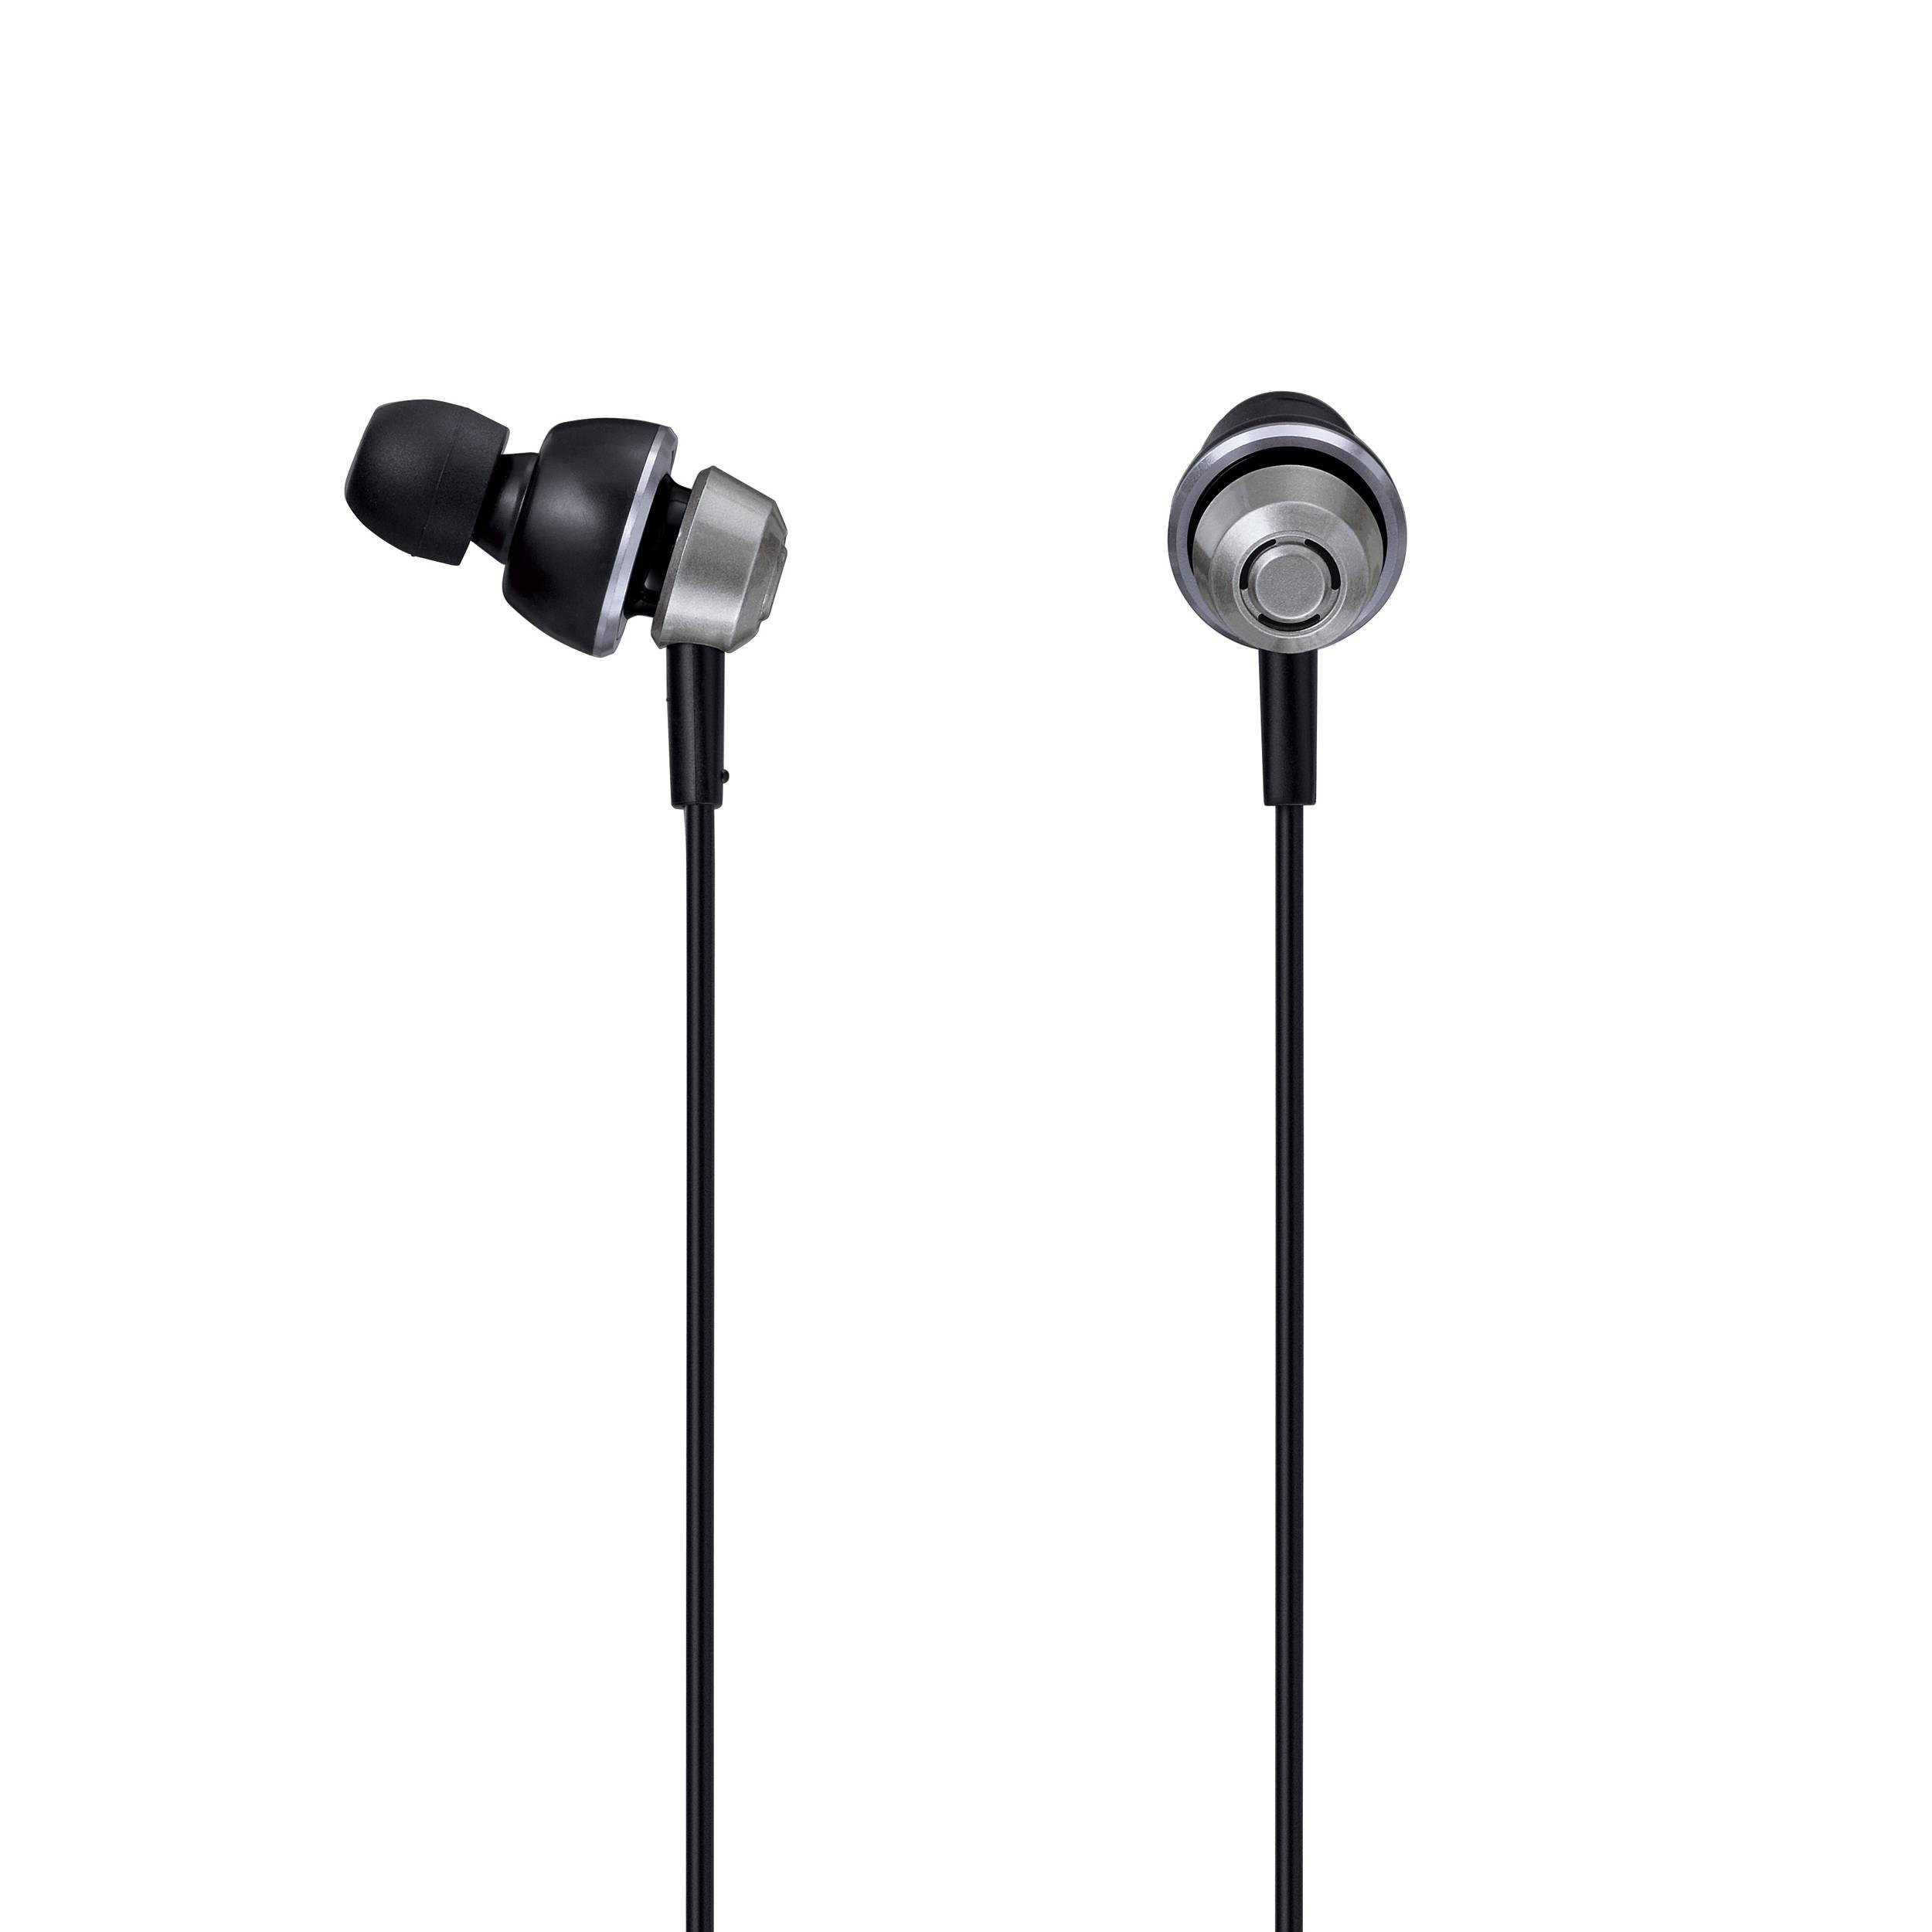 Panasonic earbuds drop 360 - panasonic earbuds bass